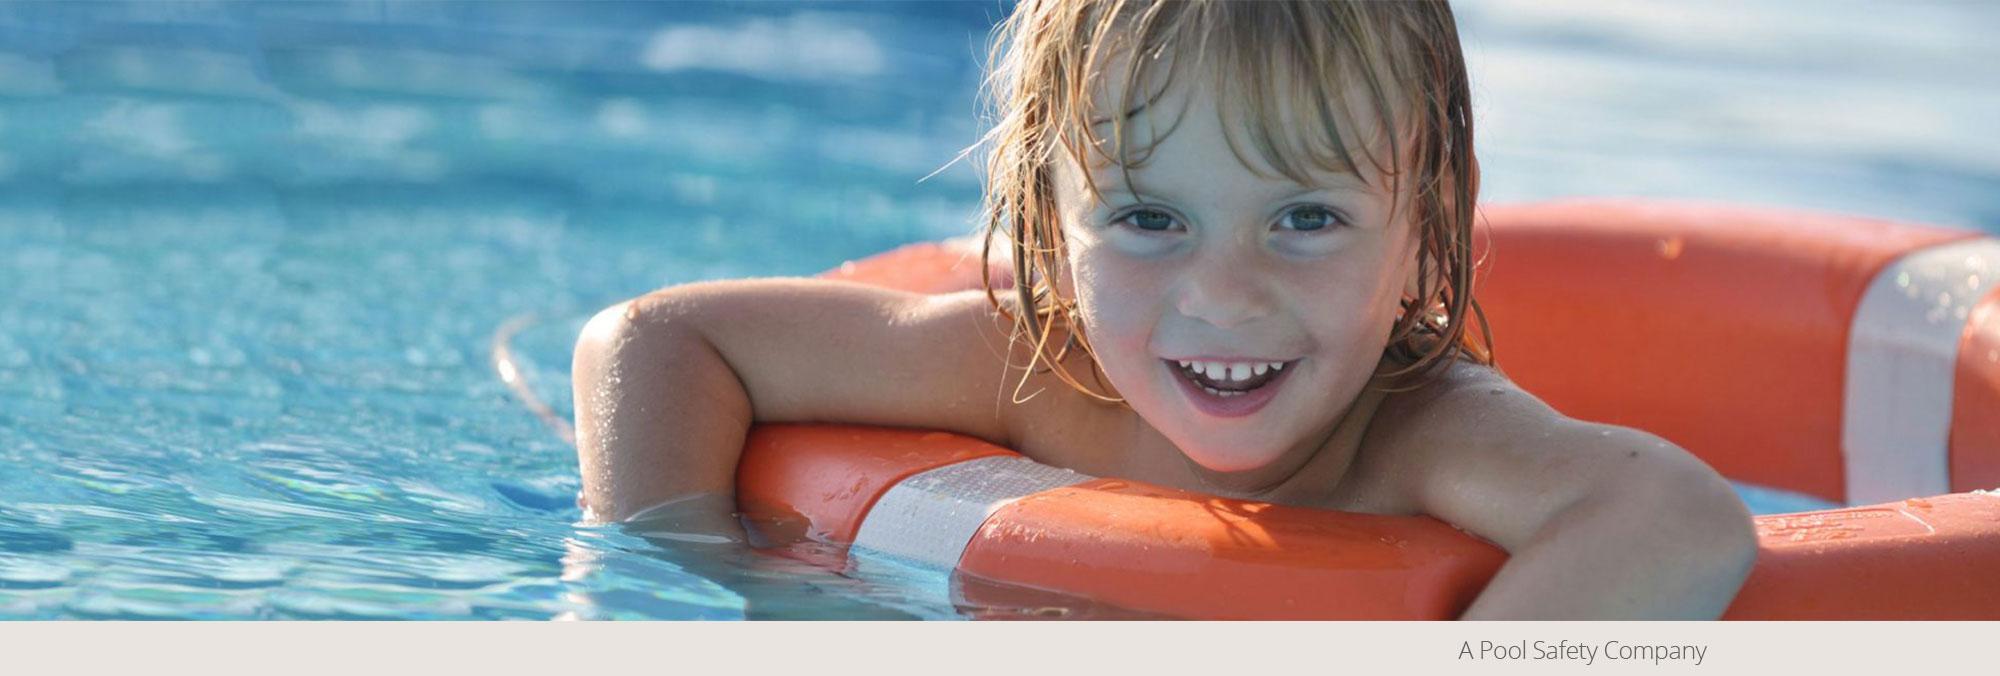 A-Pool-Safety-Company